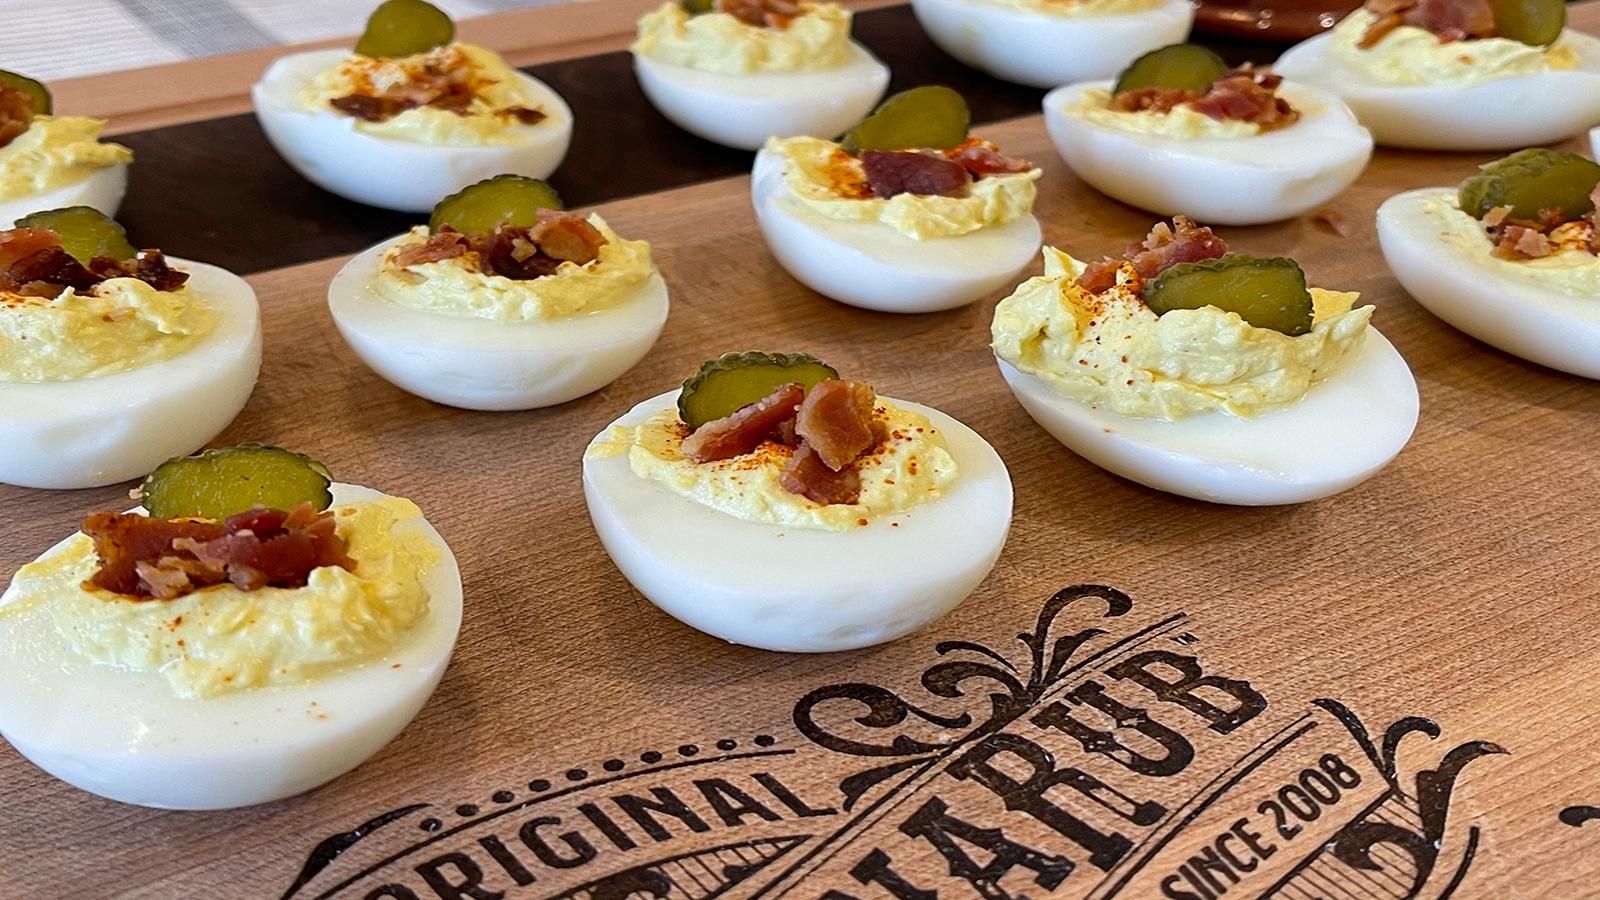 WannaRub Deviled Eggs